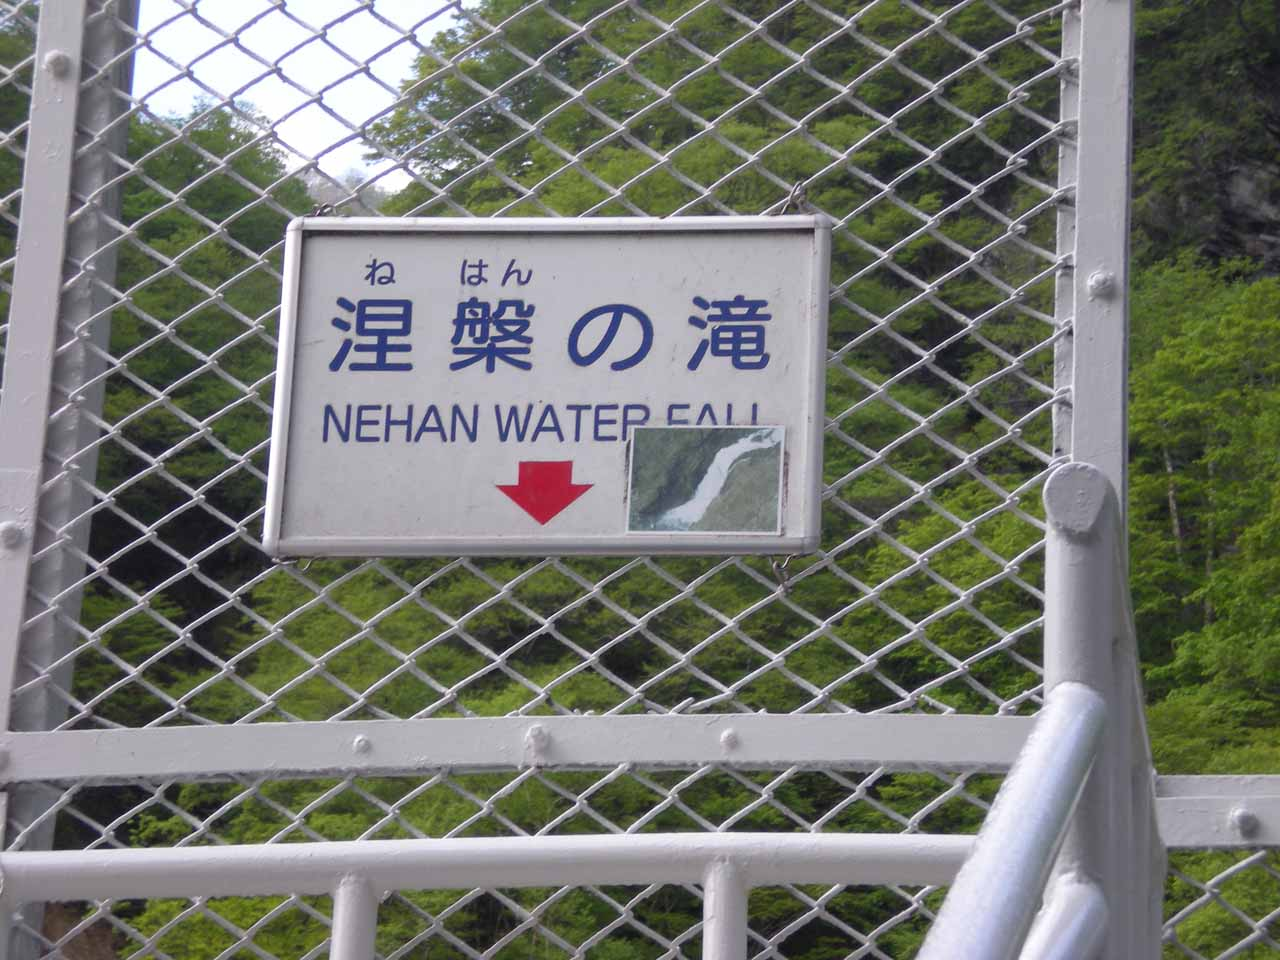 Nehan Waterfall sign